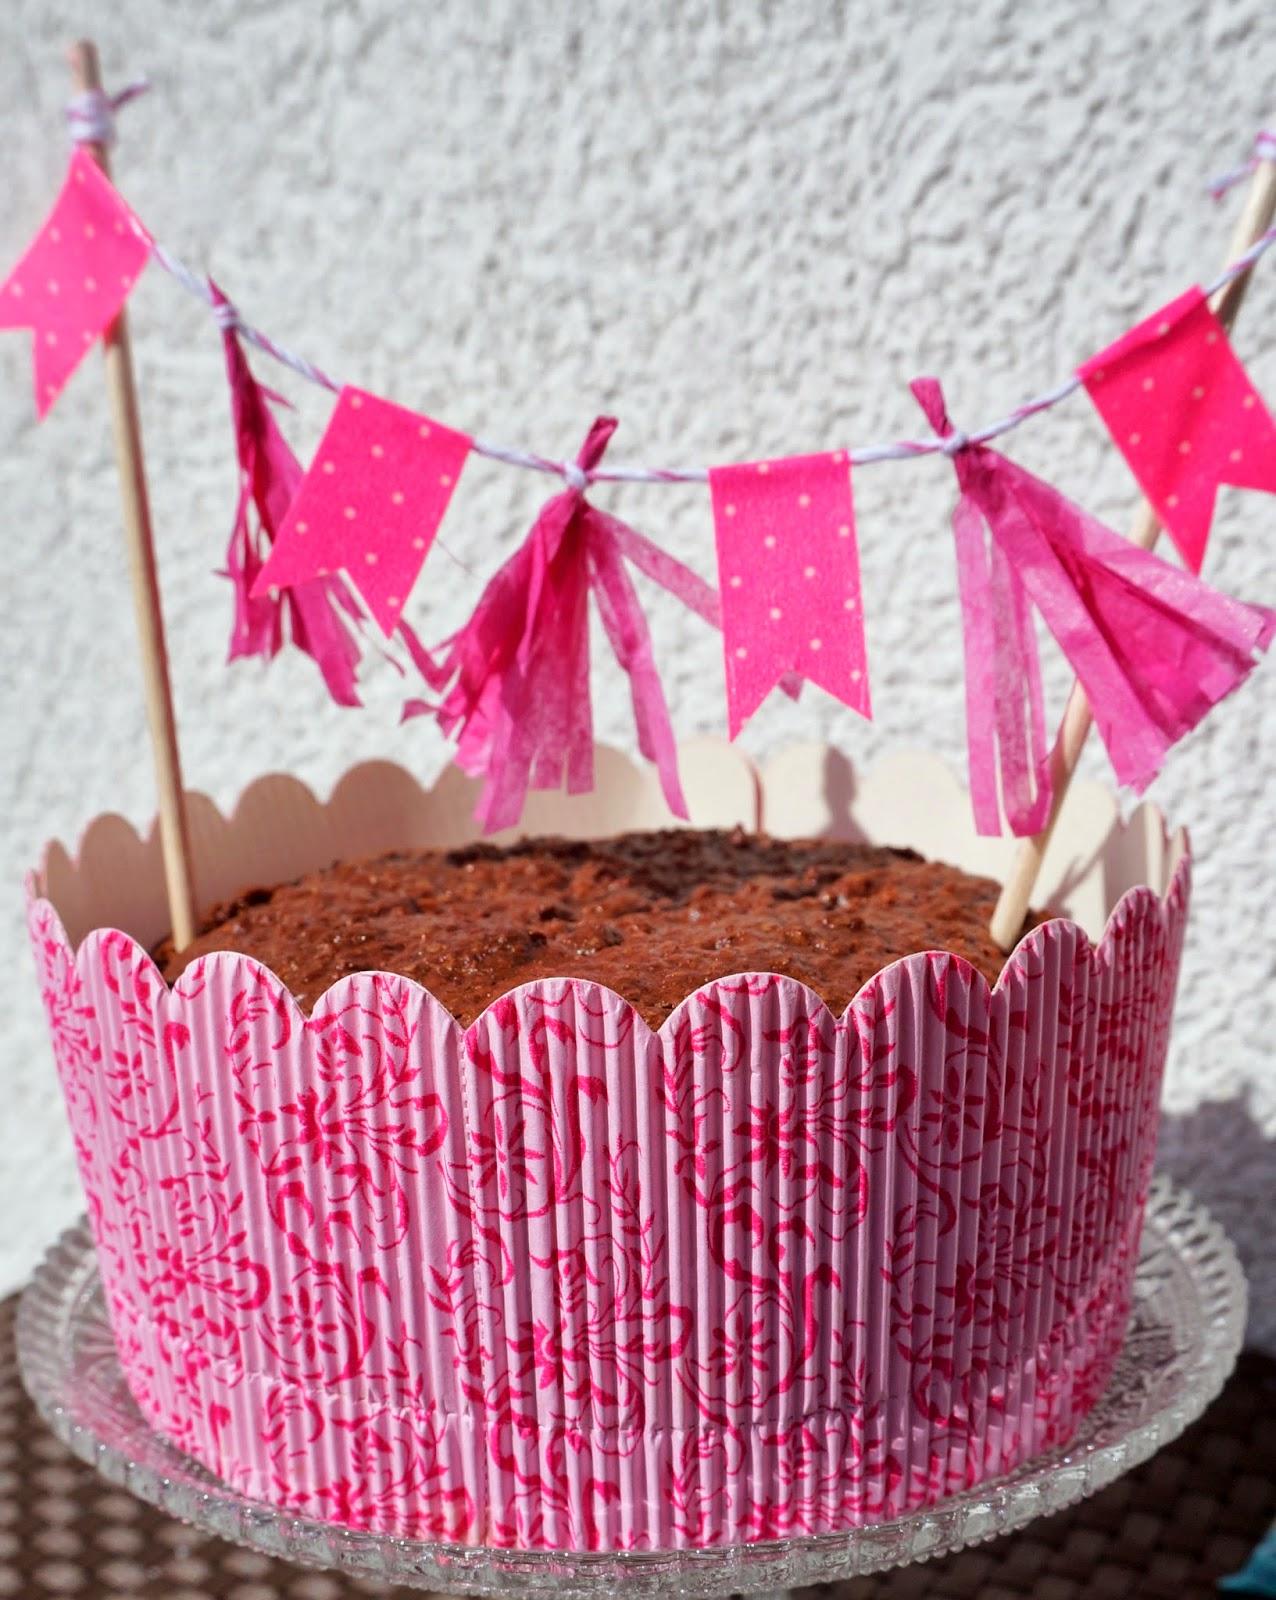 egan Chocolate Cake, Vegan Cake with coconut, veganer Kuchen, vegan Backen, Sweet Laura, pinke Kuchenform, pinke Backform